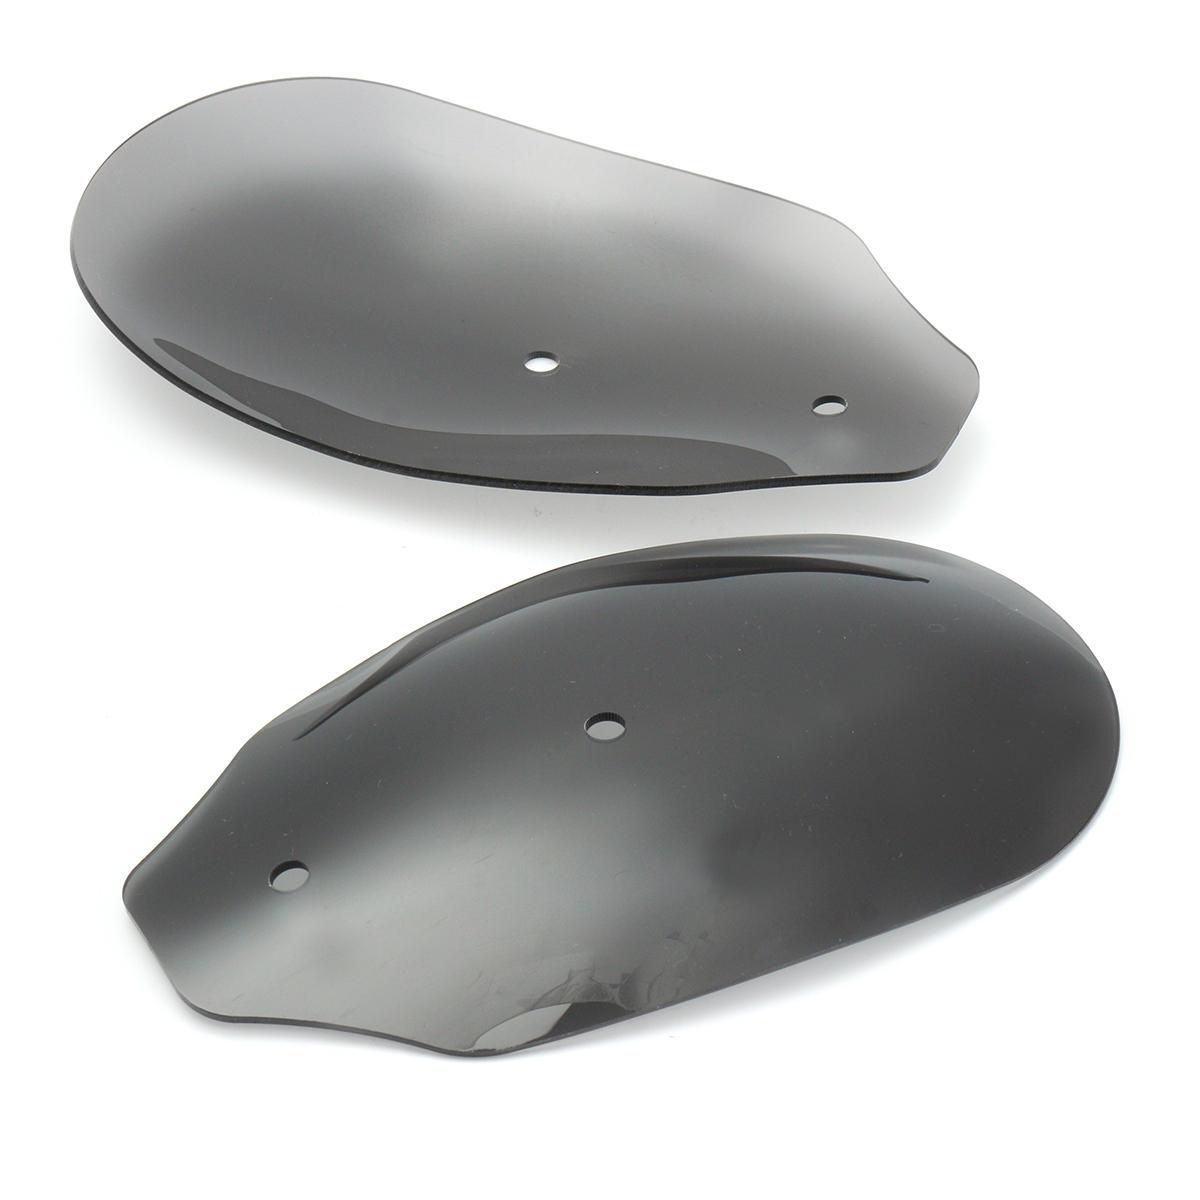 Protezioni per manubri per motociclette Manubrio per manubri Protecter per Harley XL 883 1200 Dyna Road King - 5